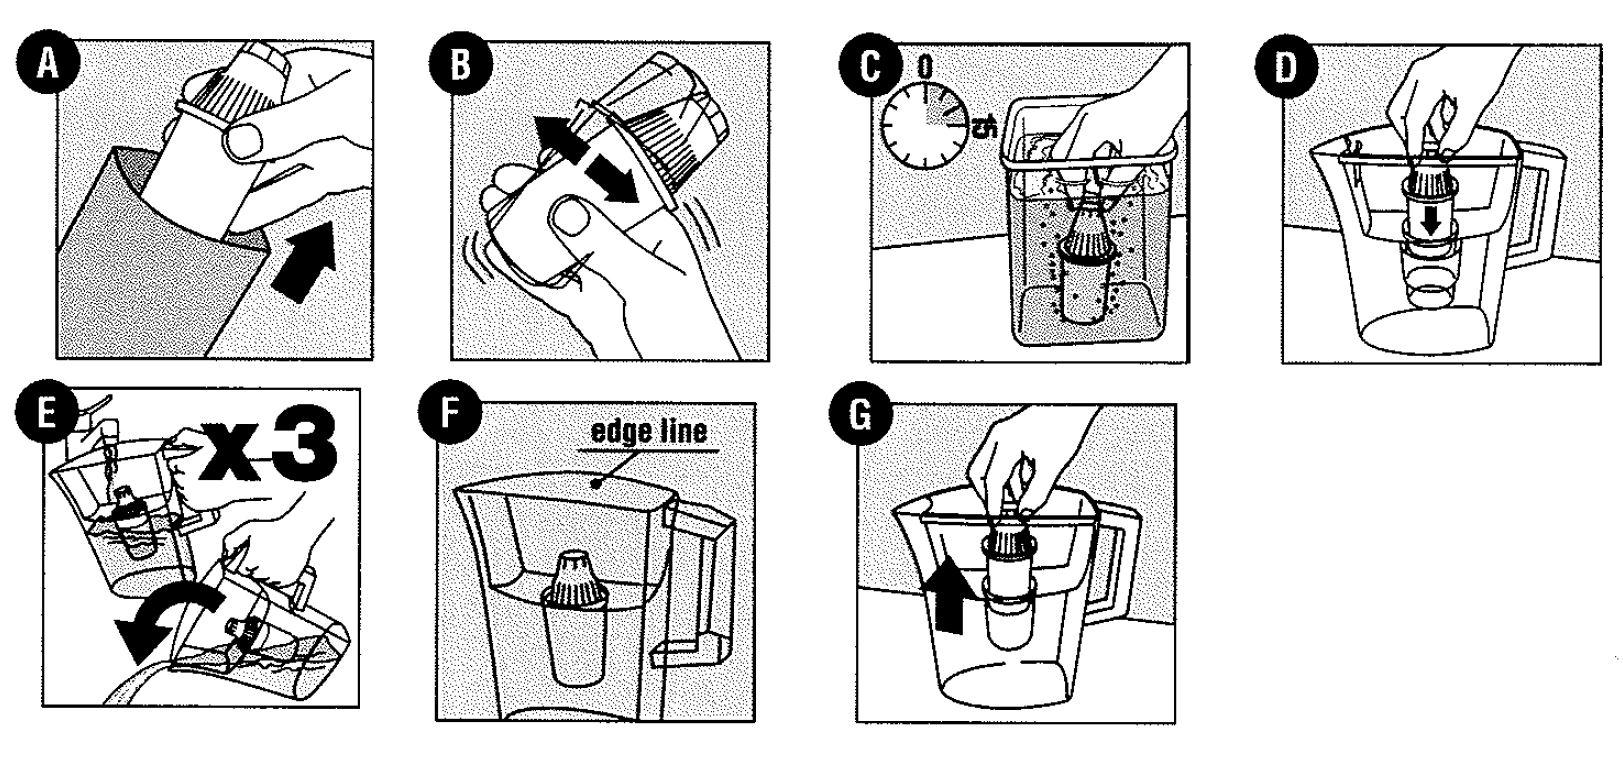 Prikaz postavljanja Multi-flux filtera u vrč